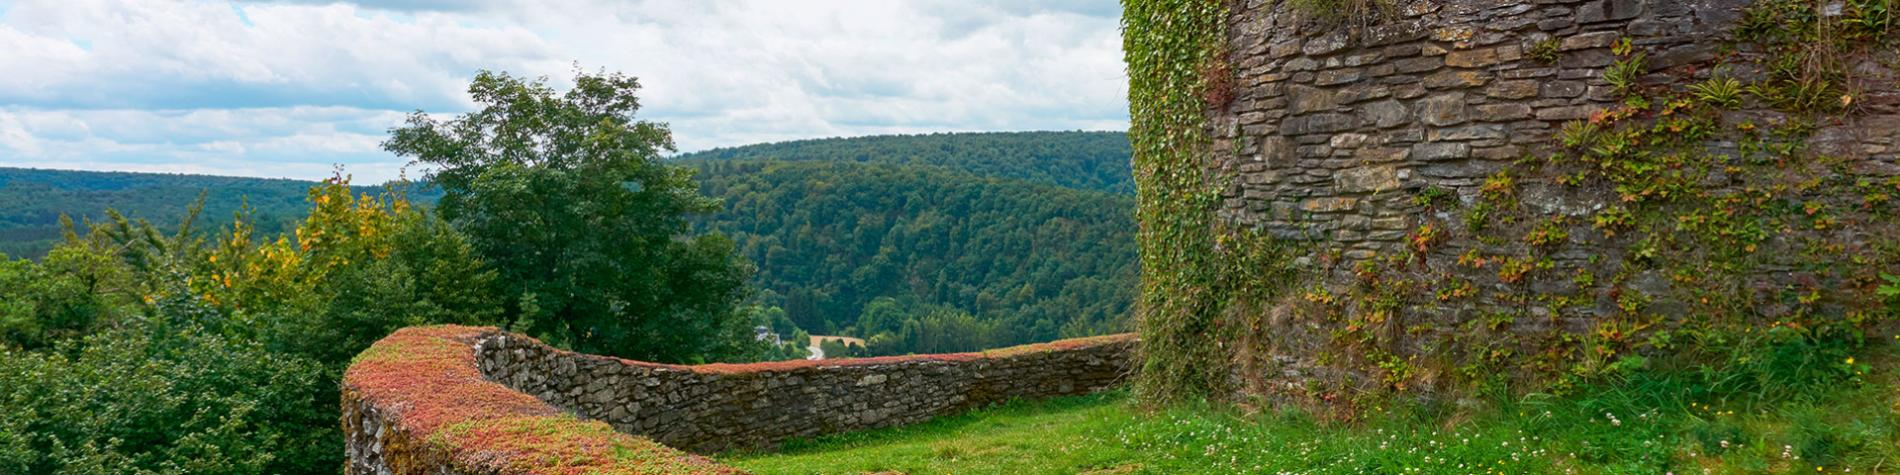 Château - Herbeumont - ruines - crête rocheurse - semois - médiéval - Jehan de Rochefort - maison de Walcourt